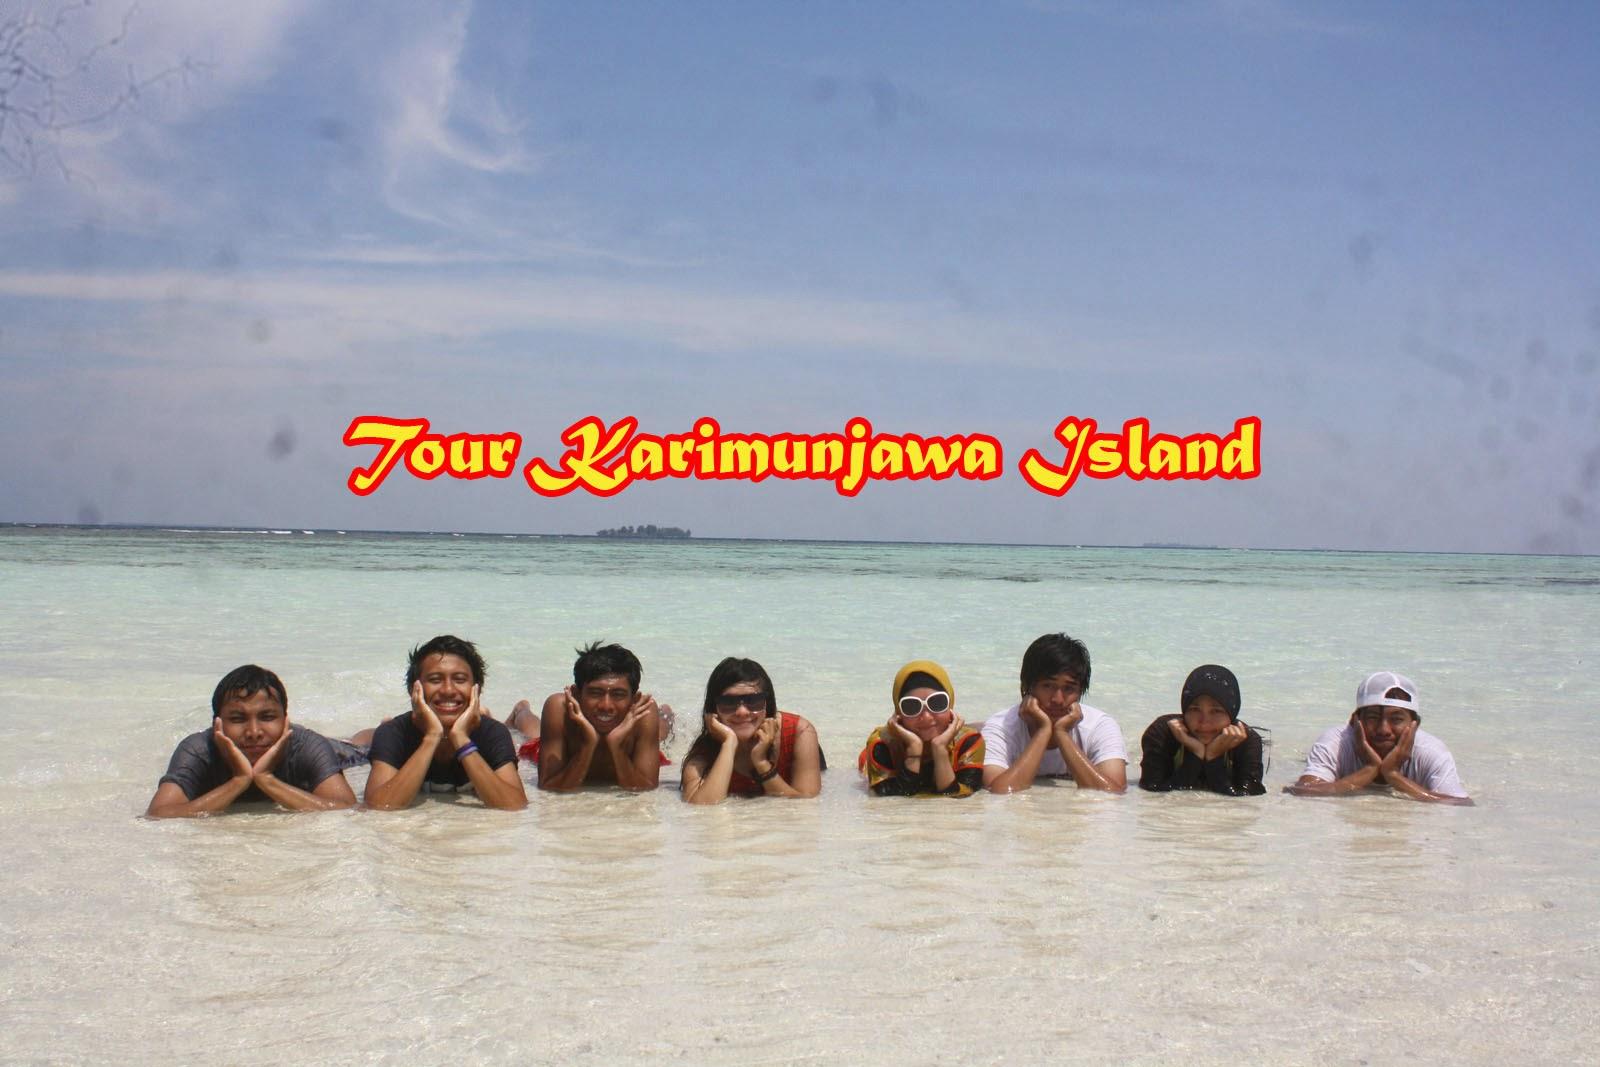 Wisata Pulau karimunjawa, Panorama karimunjawa, pantai karimunjawa, pulau karimun jawa, bawah laut karimunjawa, indahnya karimunjawa, tour karimunjawa, paket wisata karimunjawa, trip karimunjawa